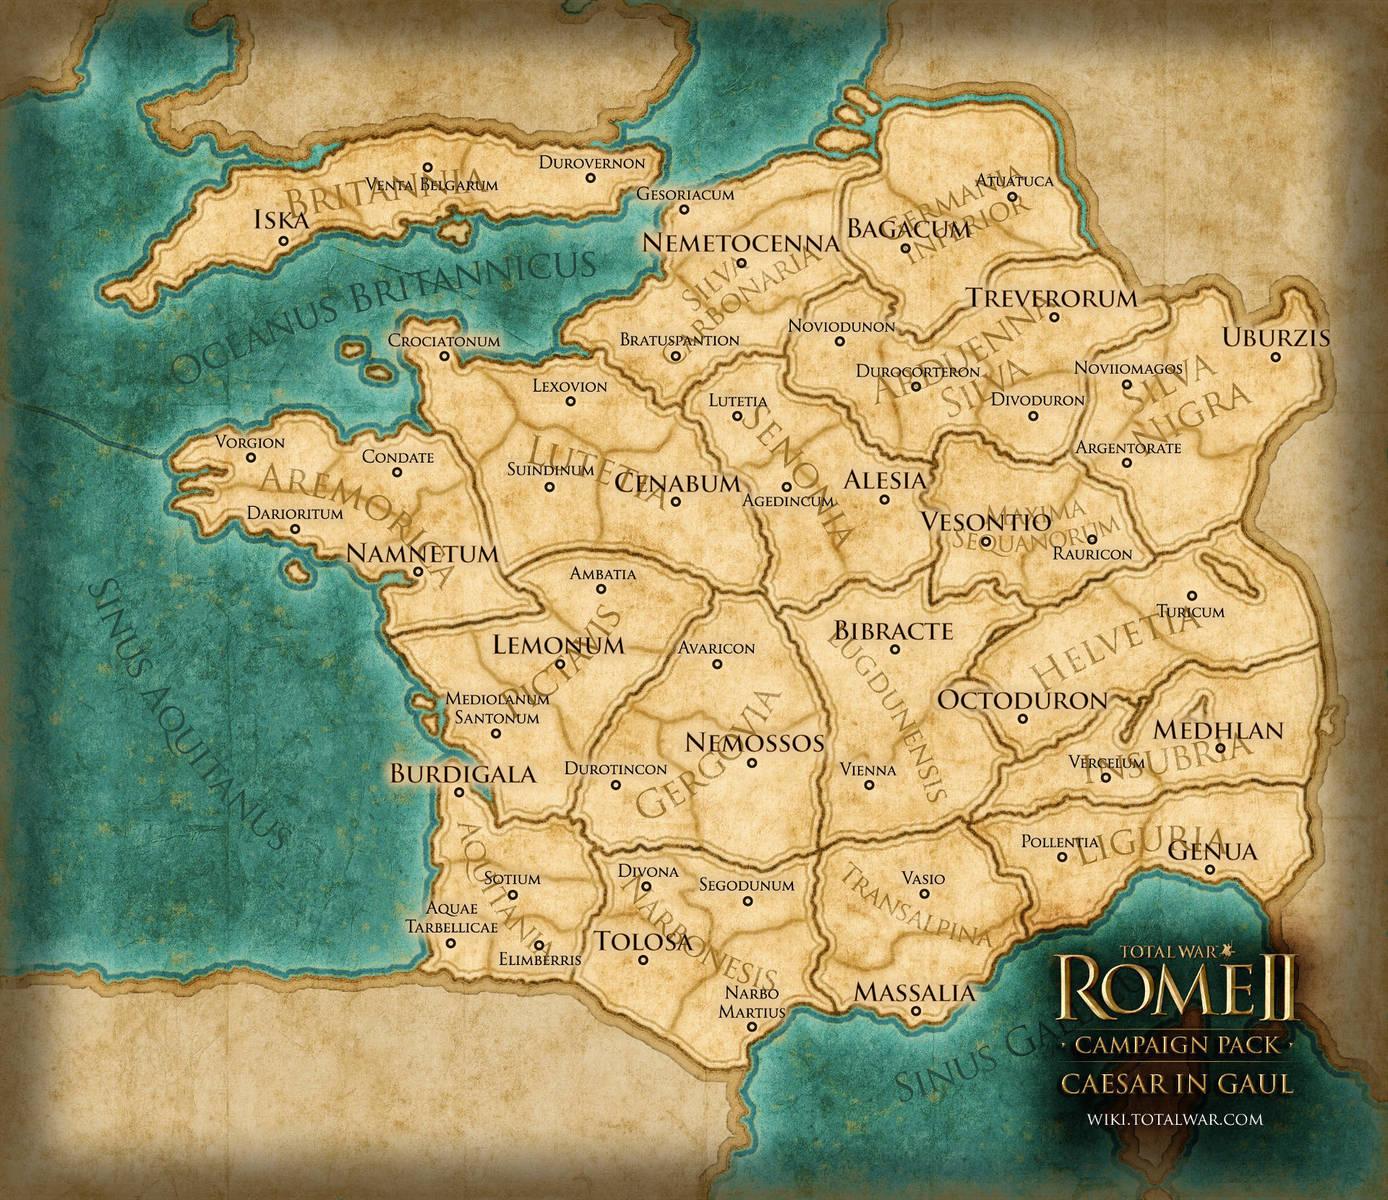 Total War ROME II Caesar In Gaul Campaign Pack Wingamestorecom - Map of rome under caesar